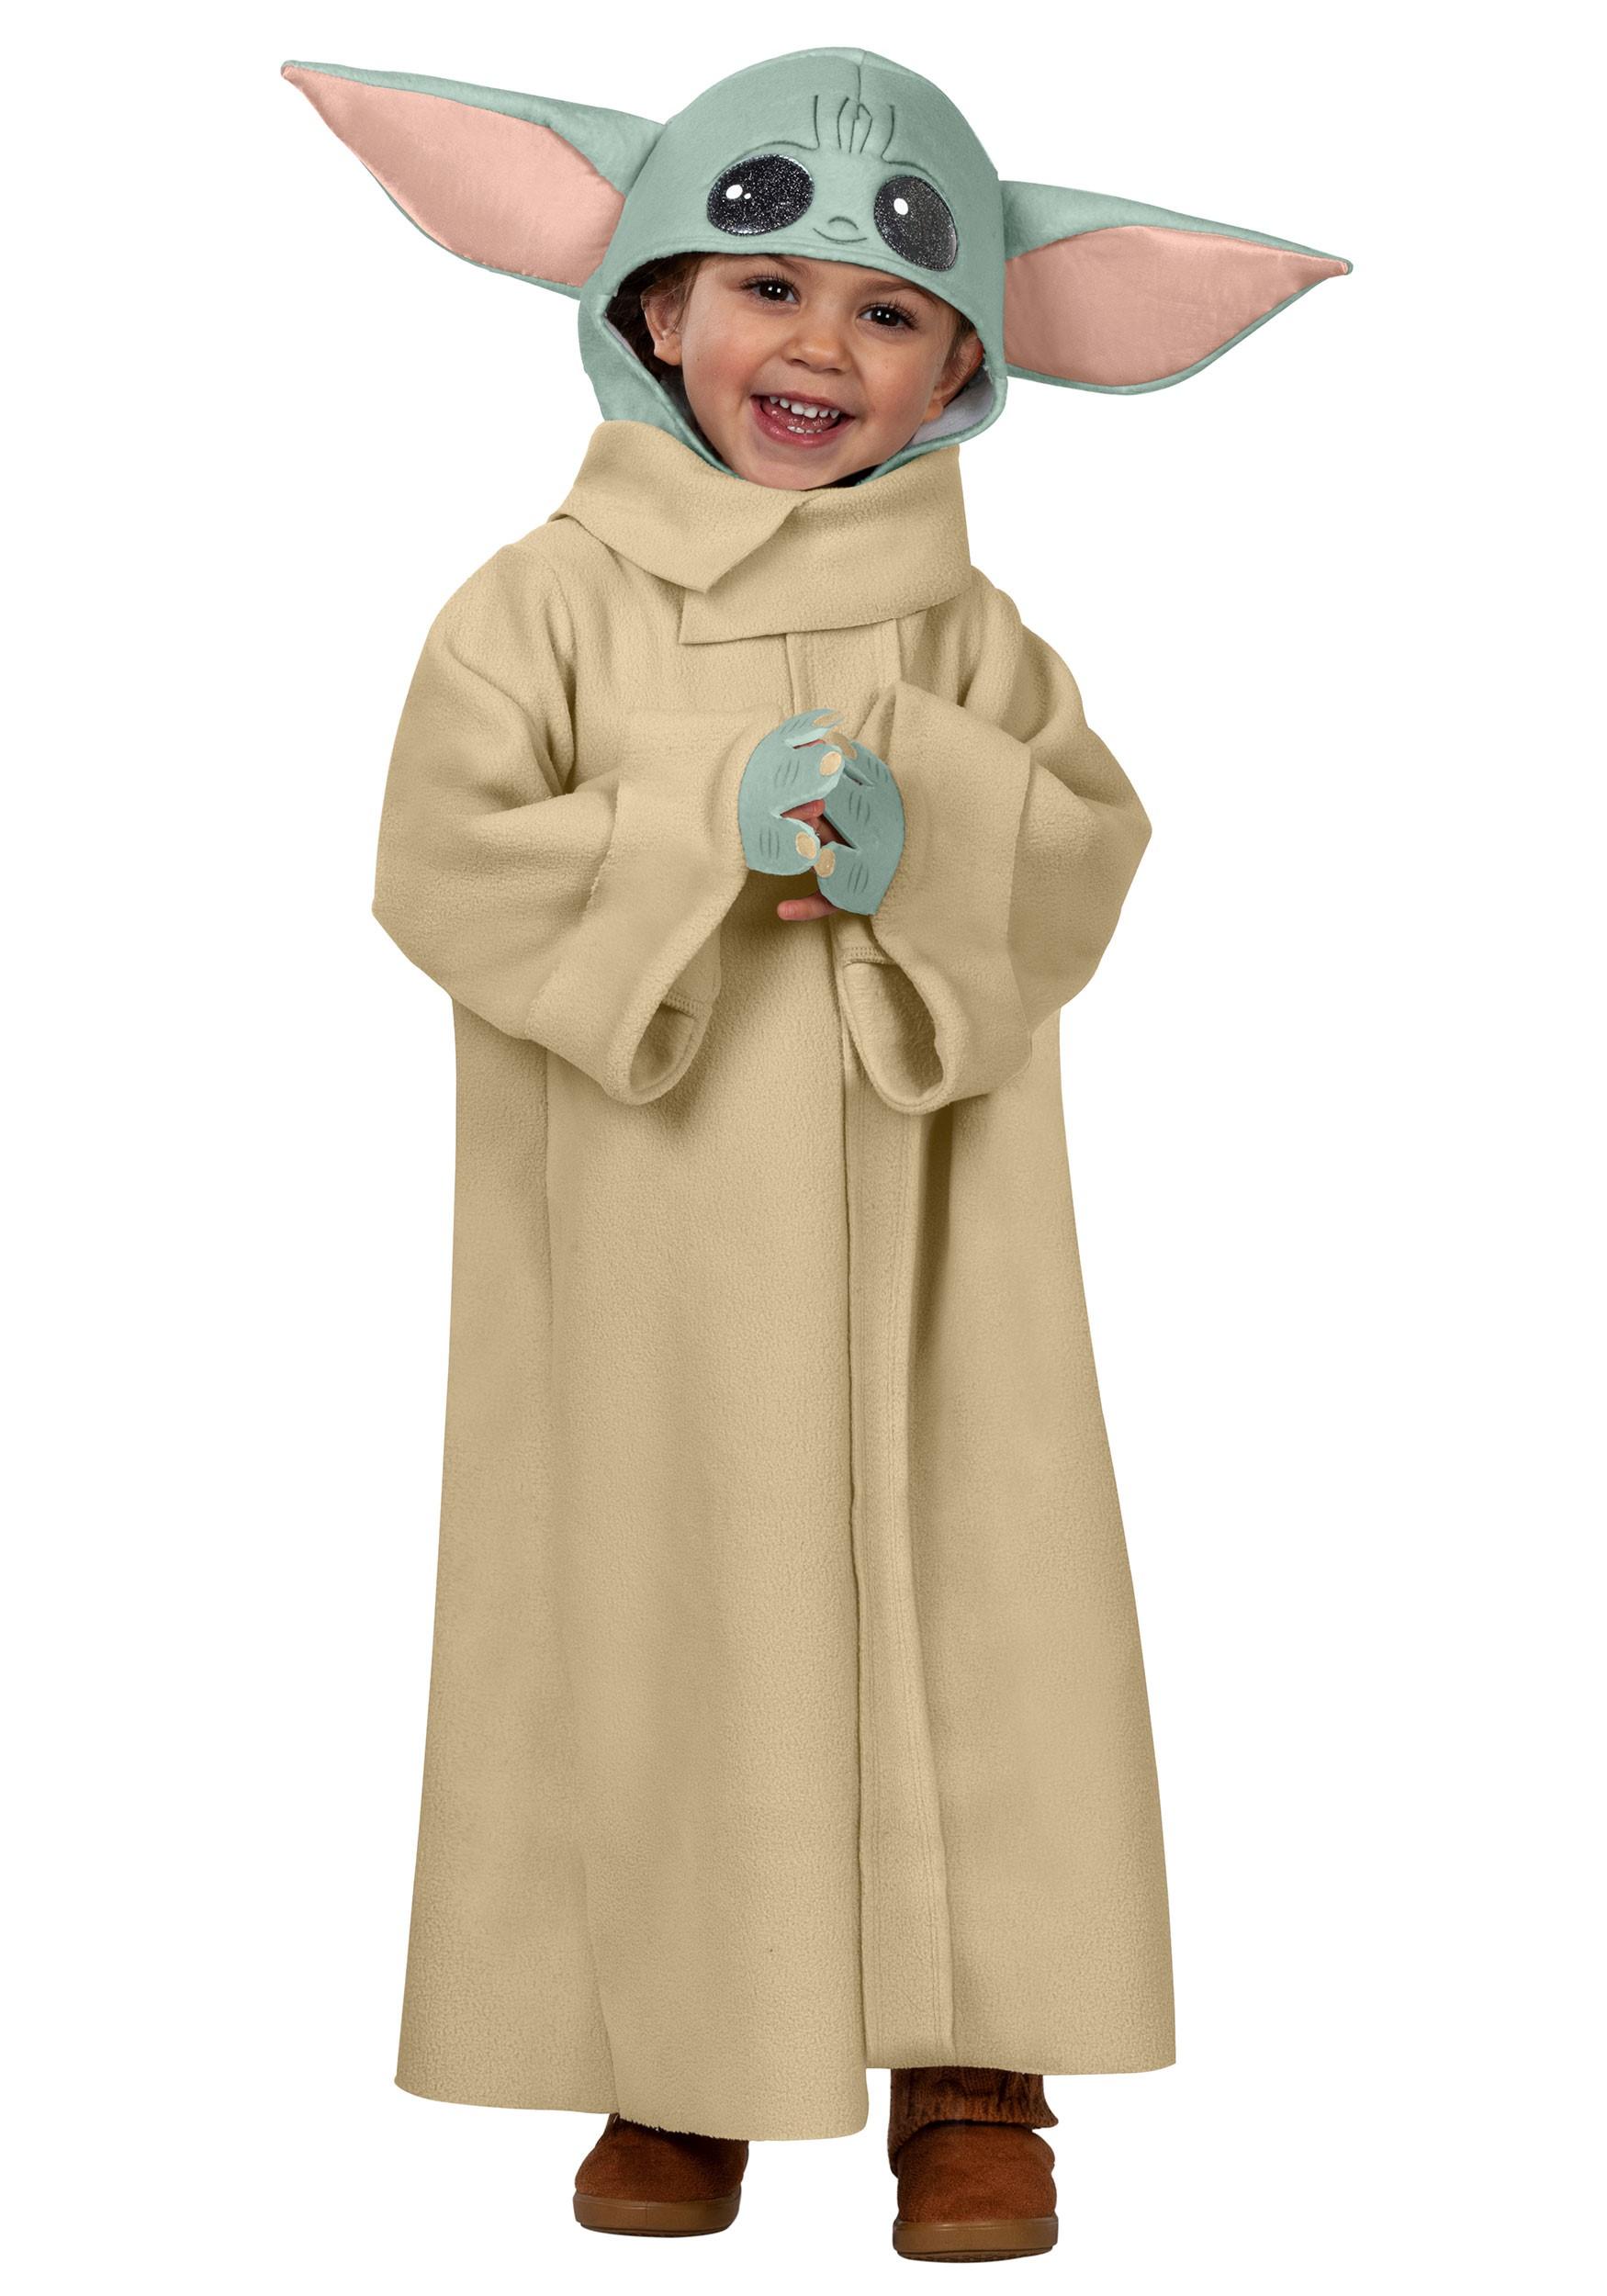 Kids The Child Mandalorian Costume